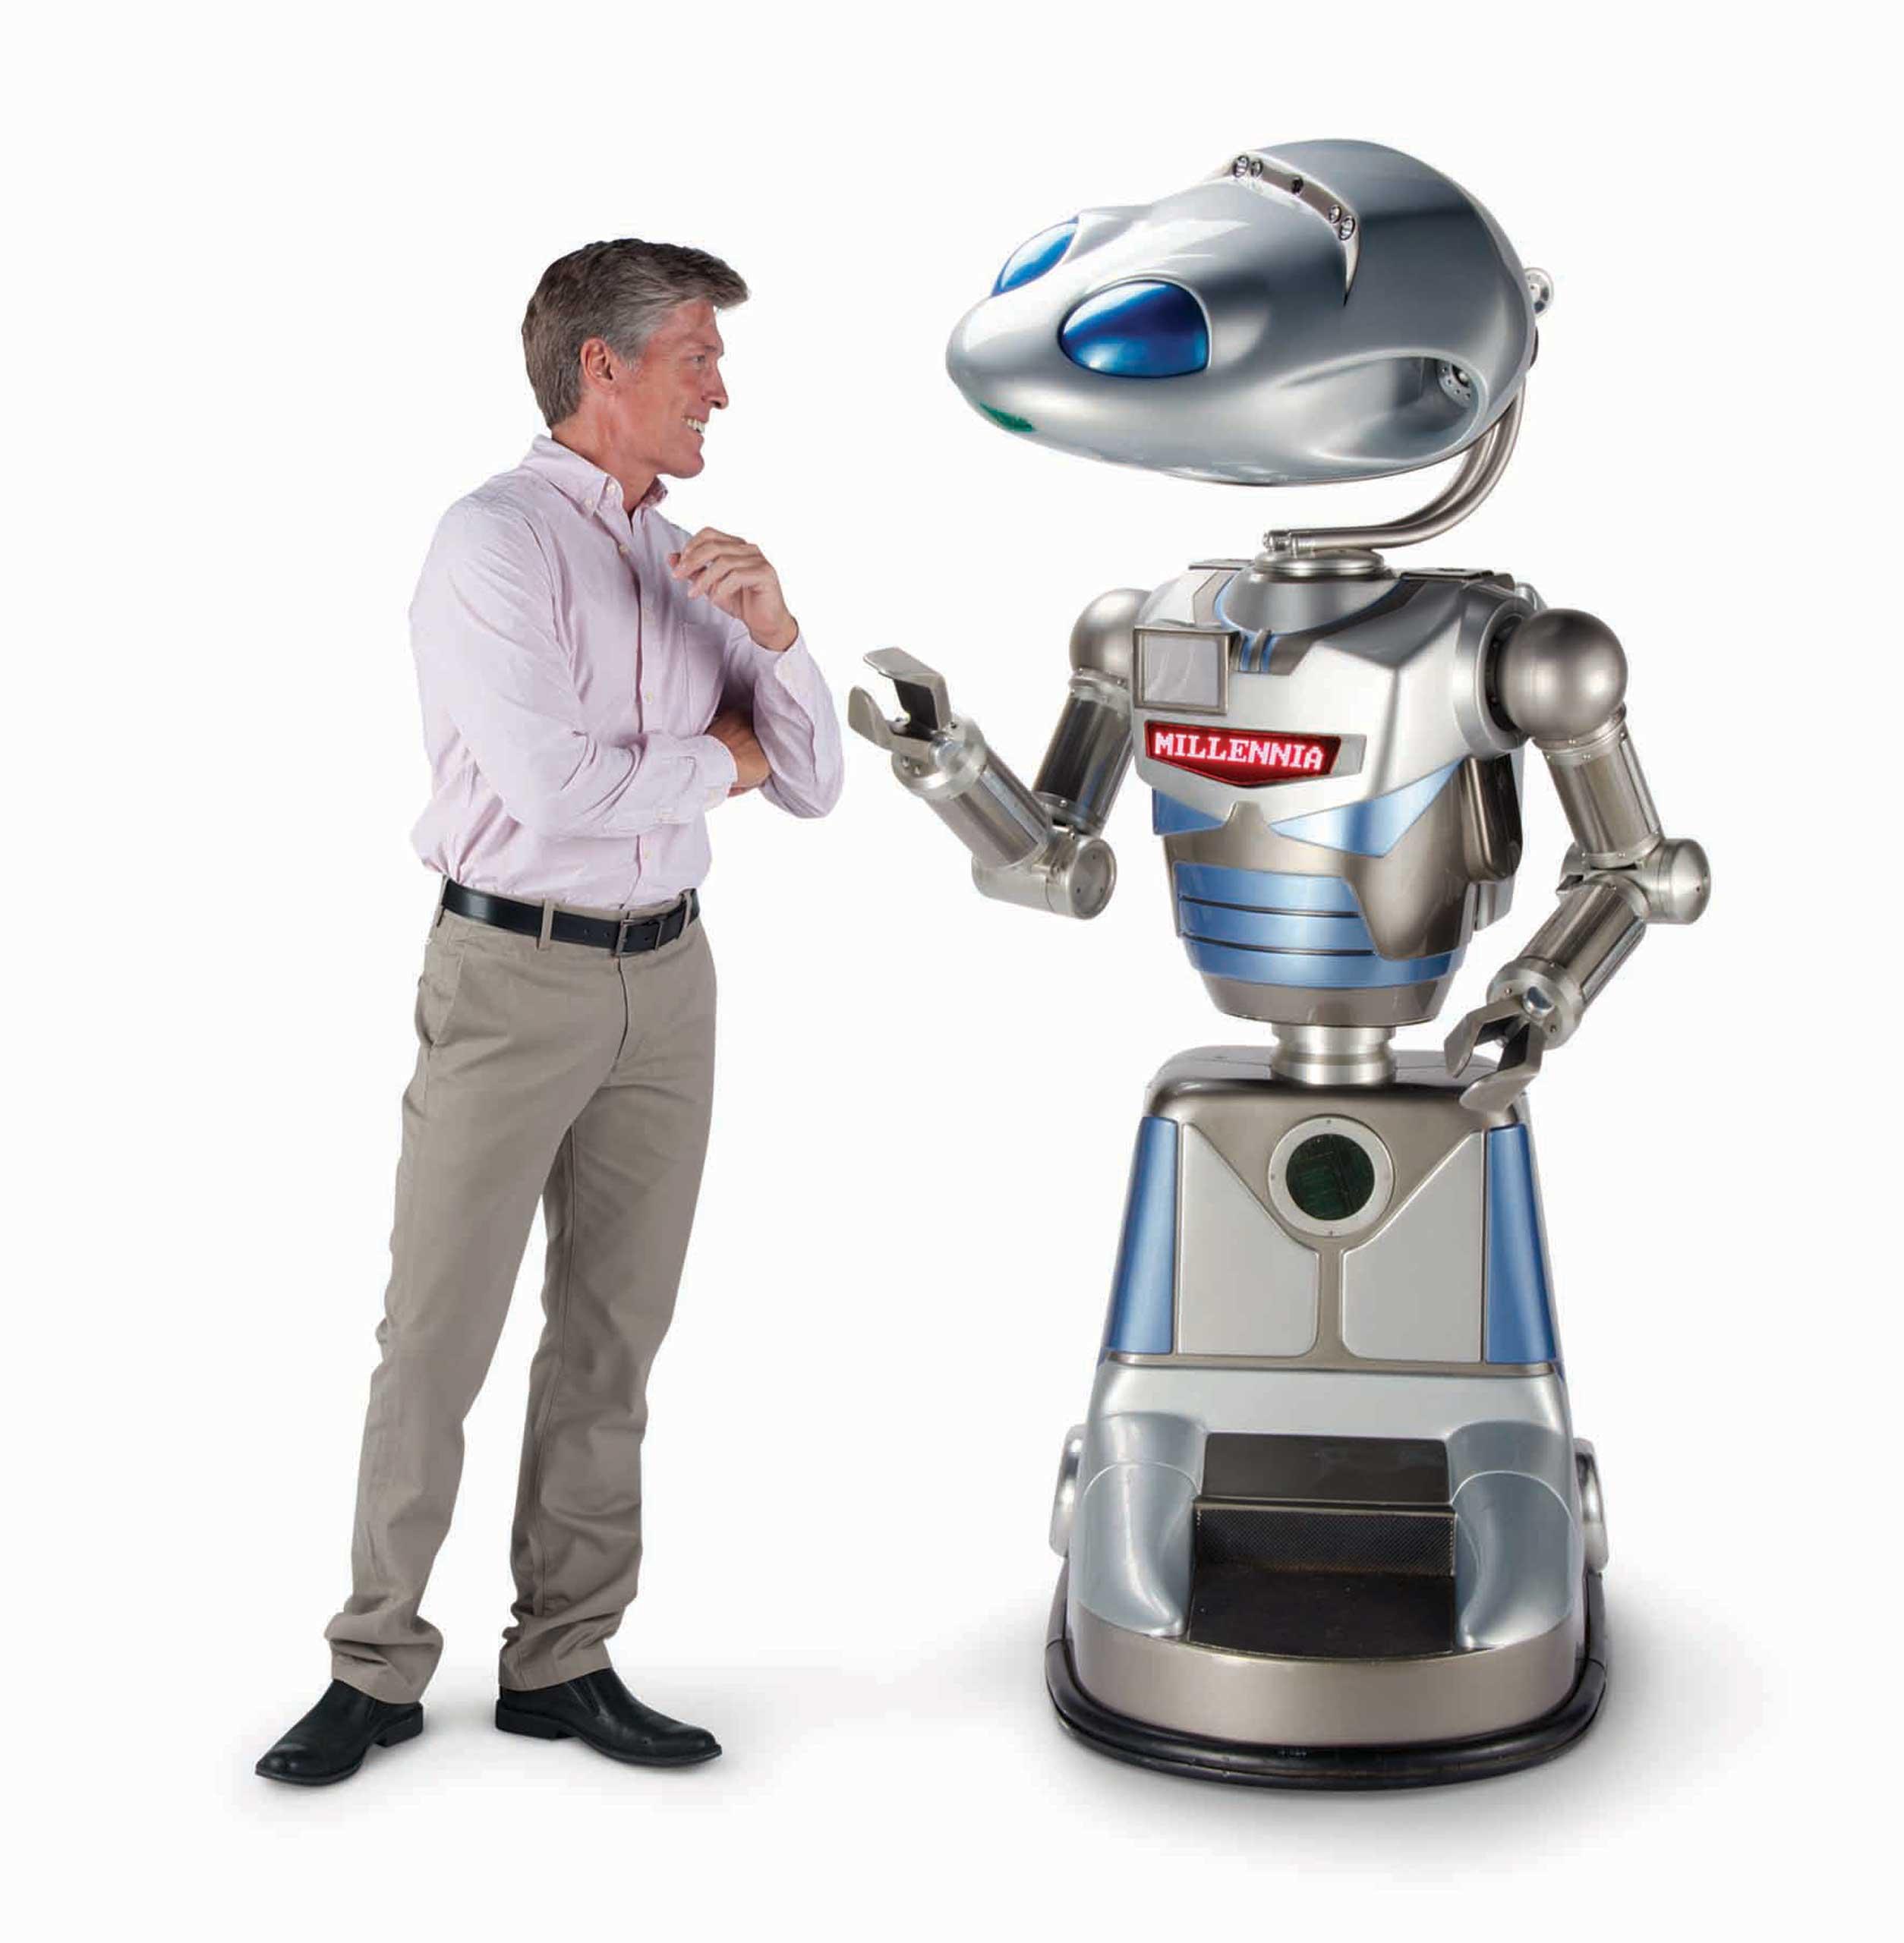 The Celebrity Robotic Avatar